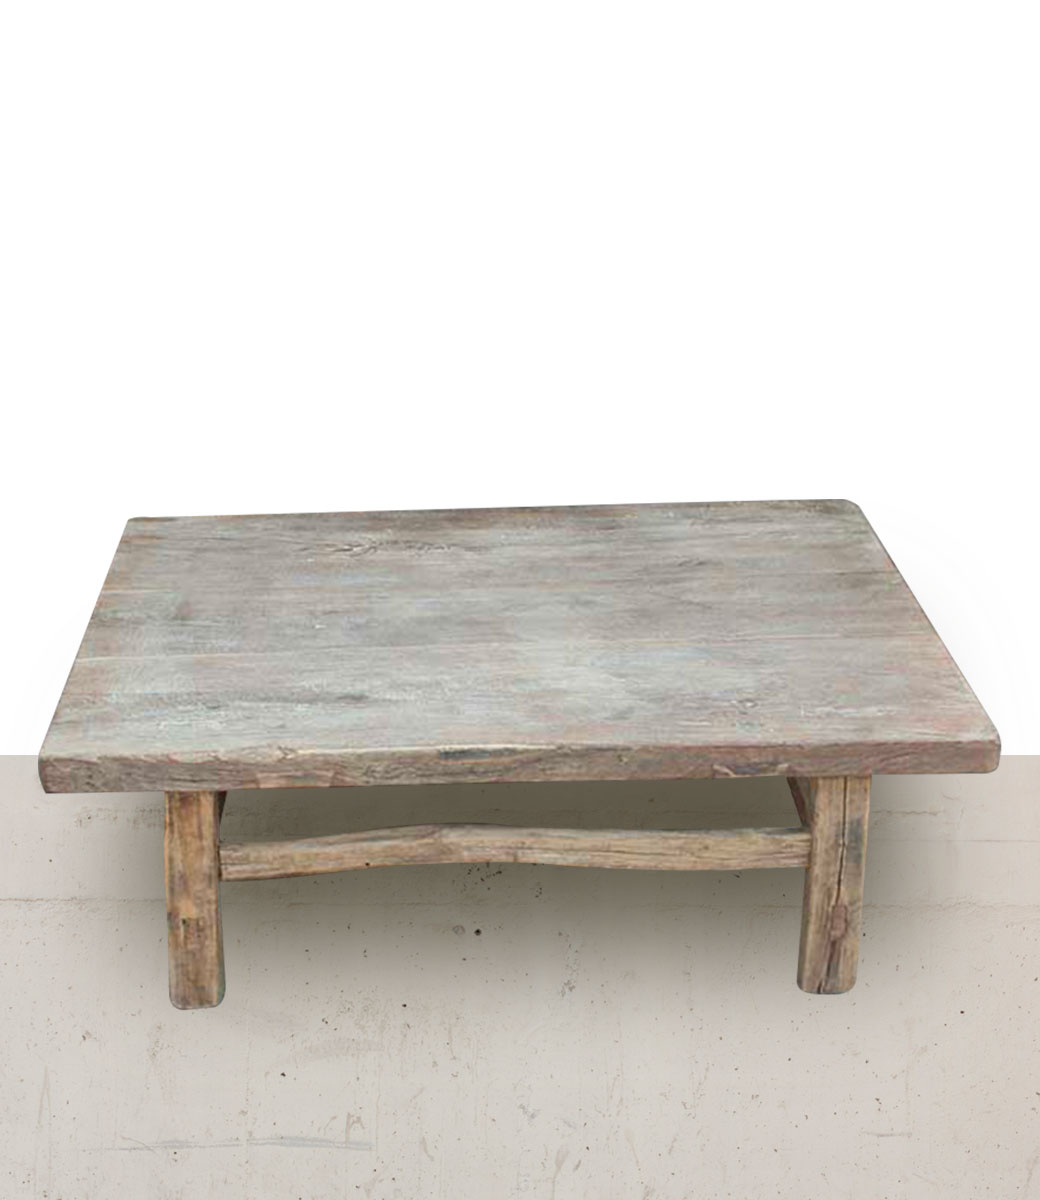 coffee table lounge raw wood 81x60xh29cm unique item